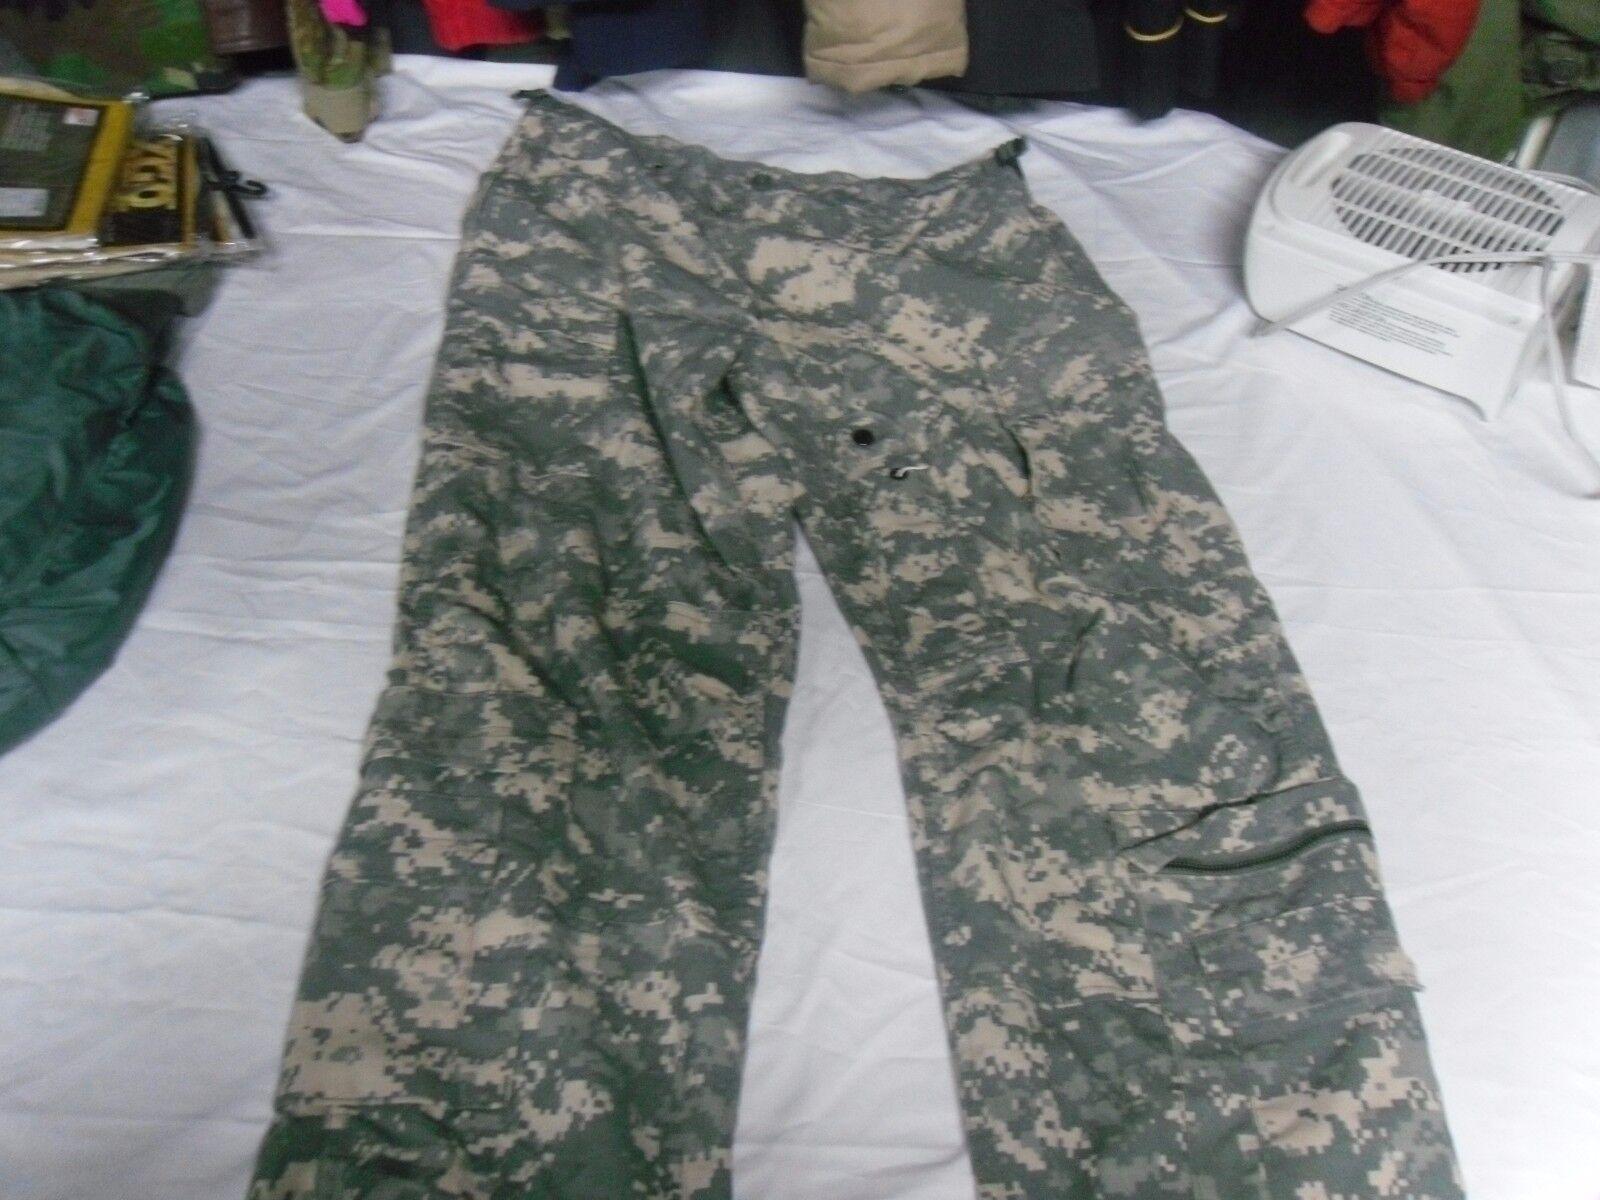 A2CU ACU DIGITAL PATTERN ARMY AIRCREW COMBAT BOTTOMS FLAME RETARDANT PANTS USED